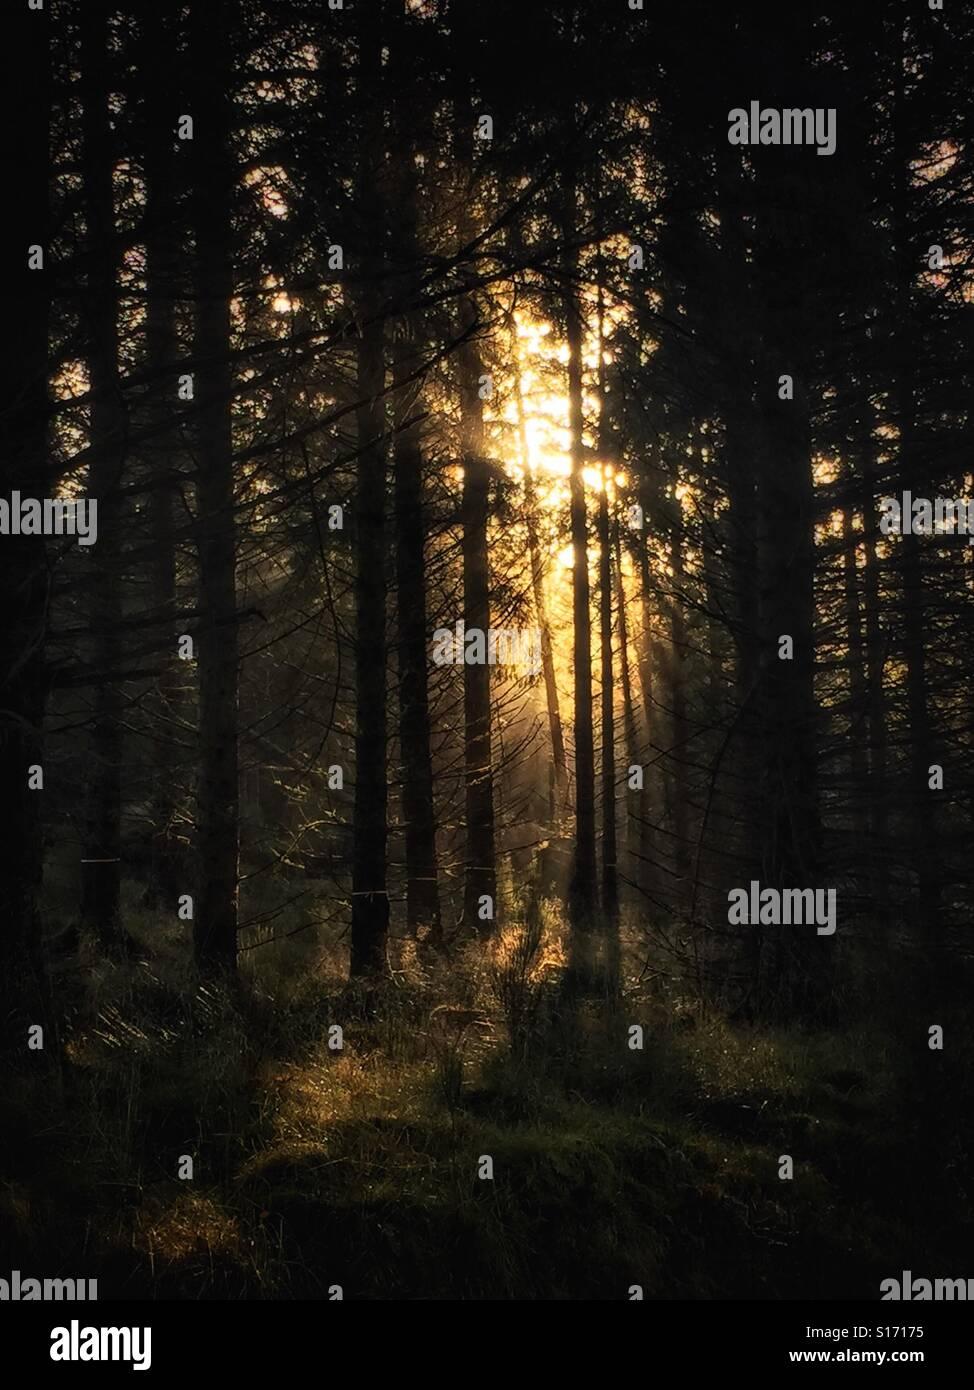 Sun bursting through trees. - Stock Image